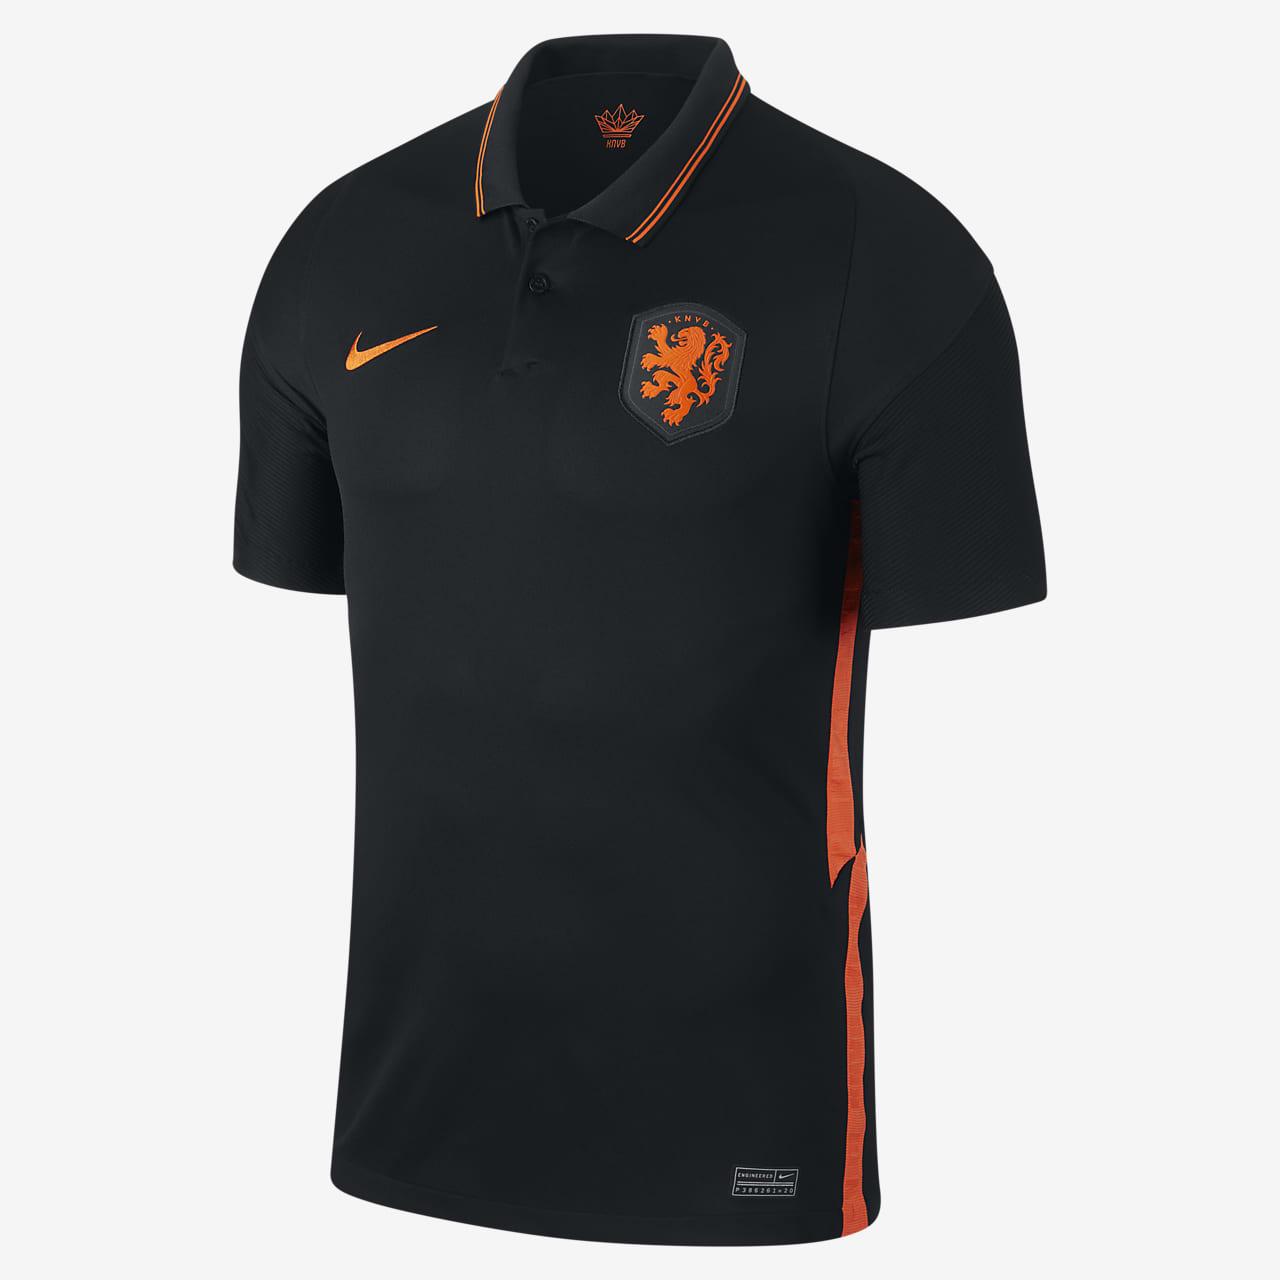 Niederlande 2020 Stadium Away Herren-Fußballtrikot